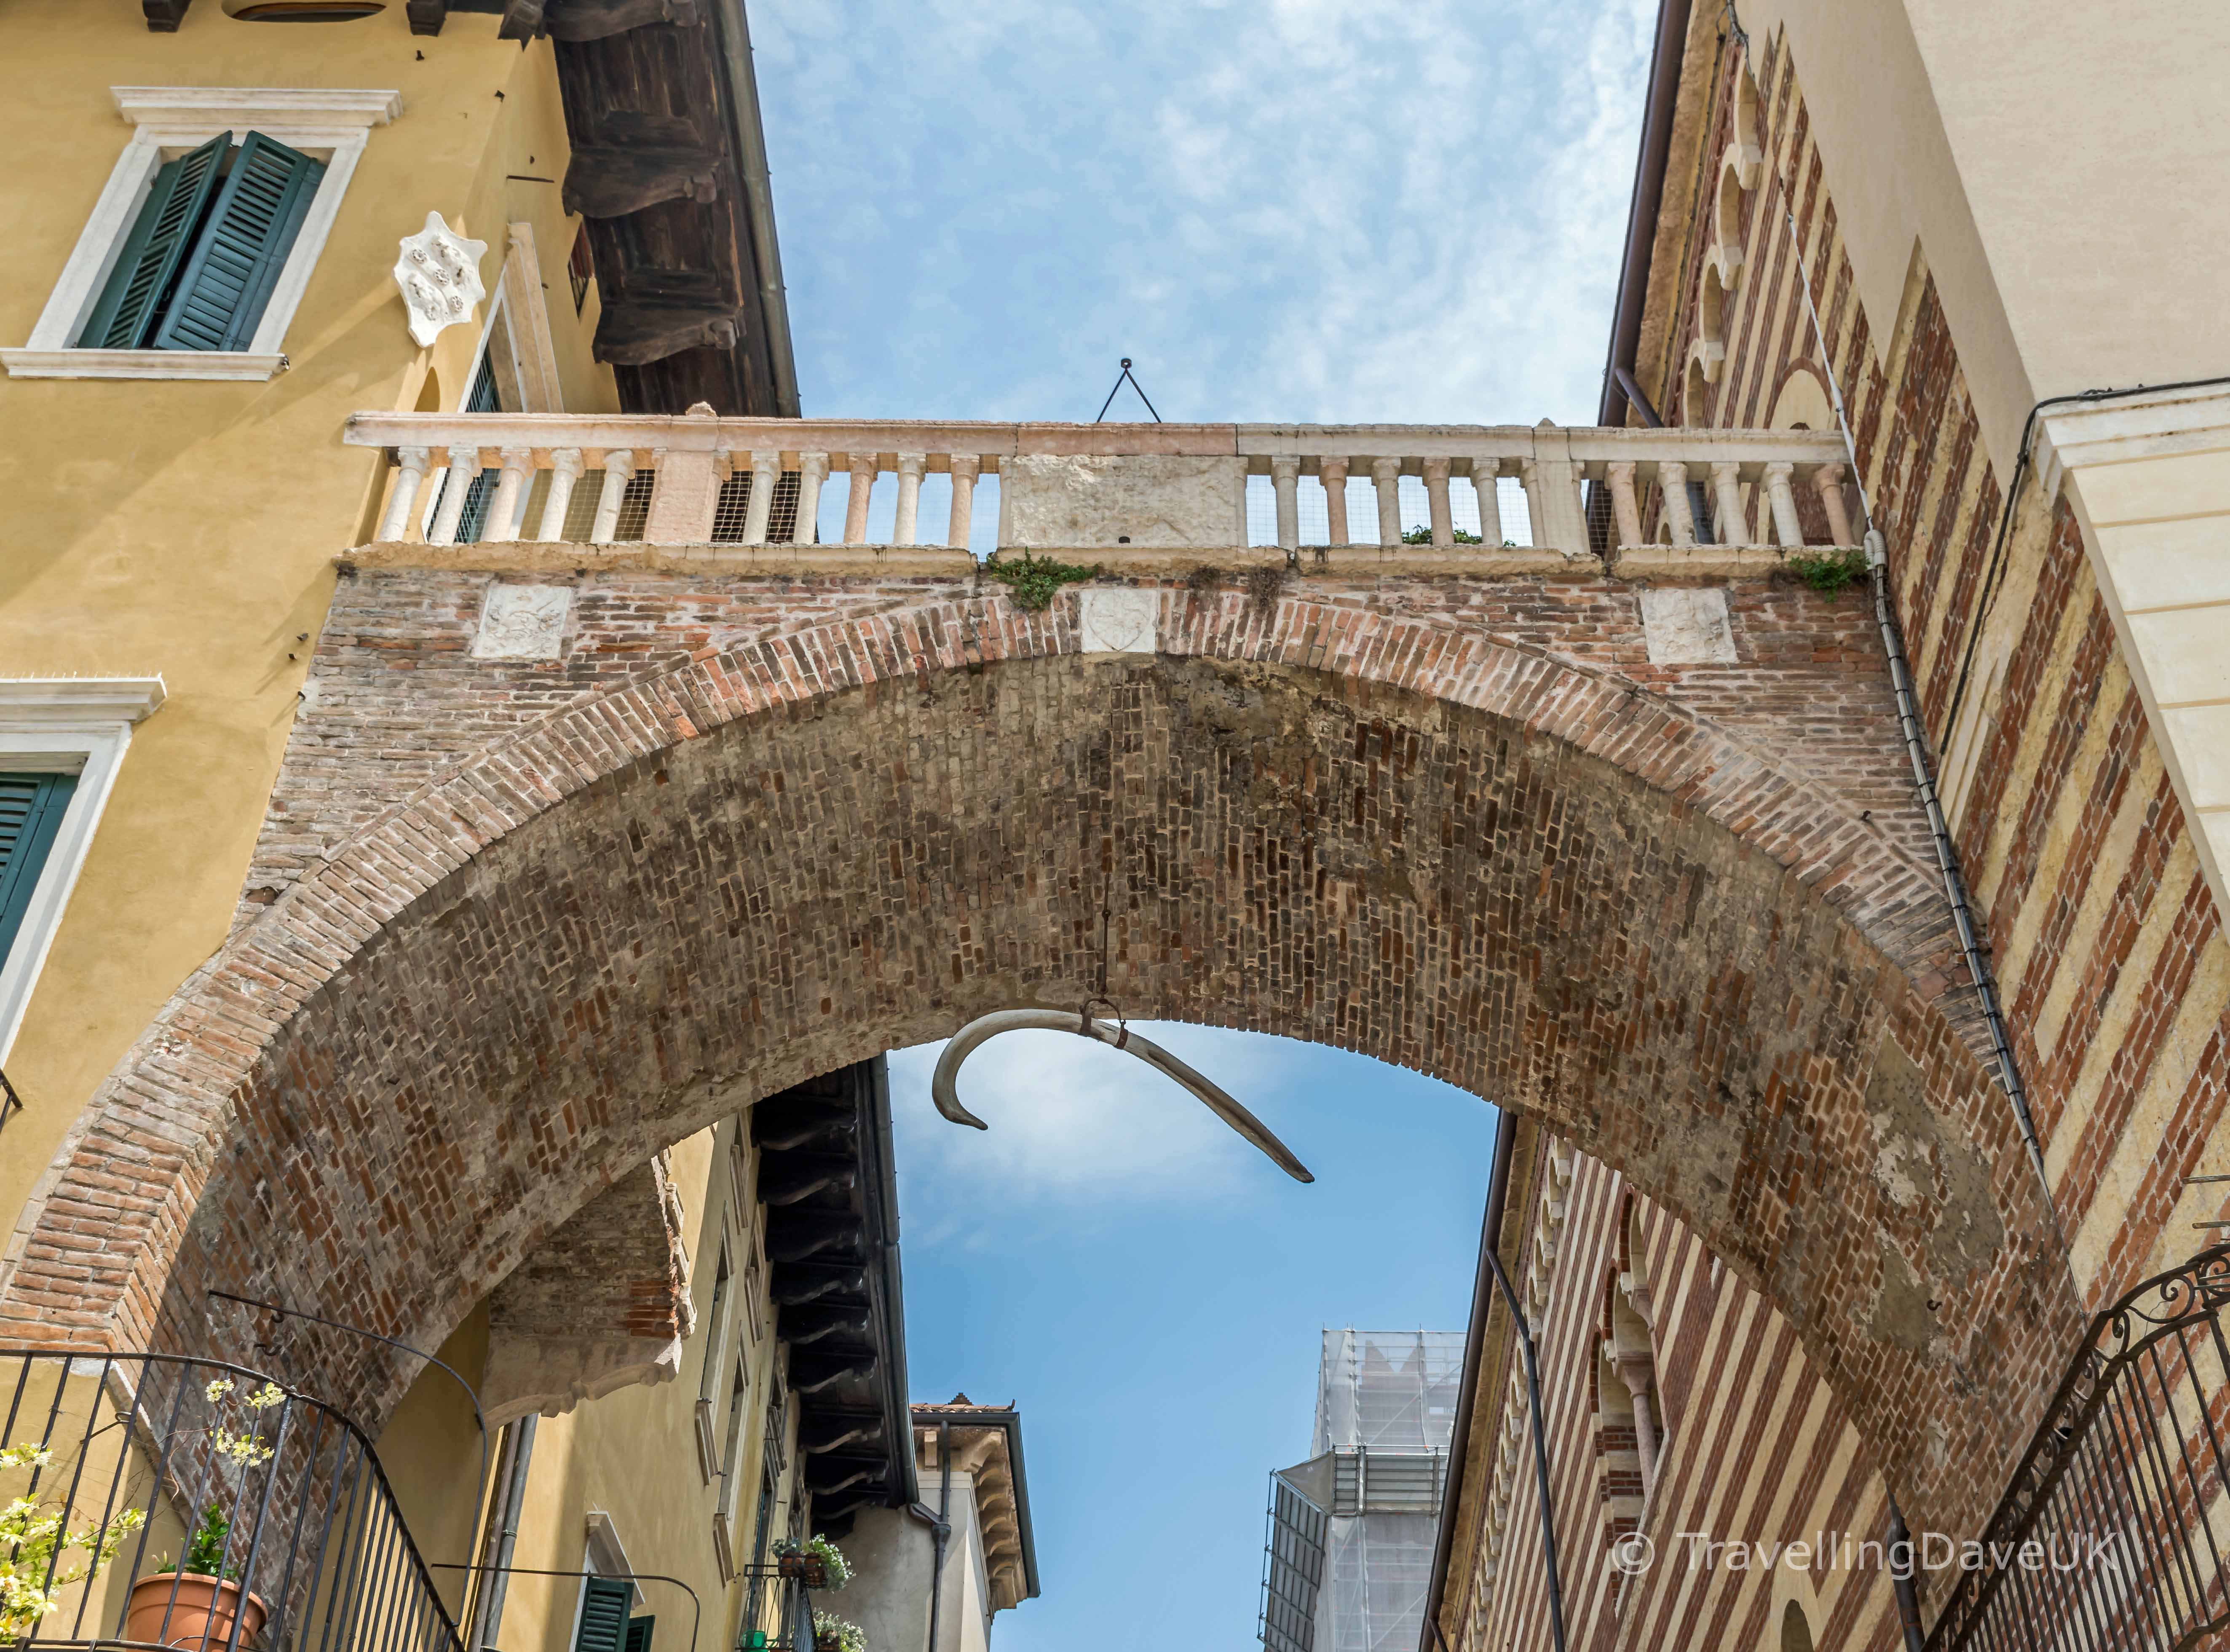 Bone hanging from Arco della Costa in Verona